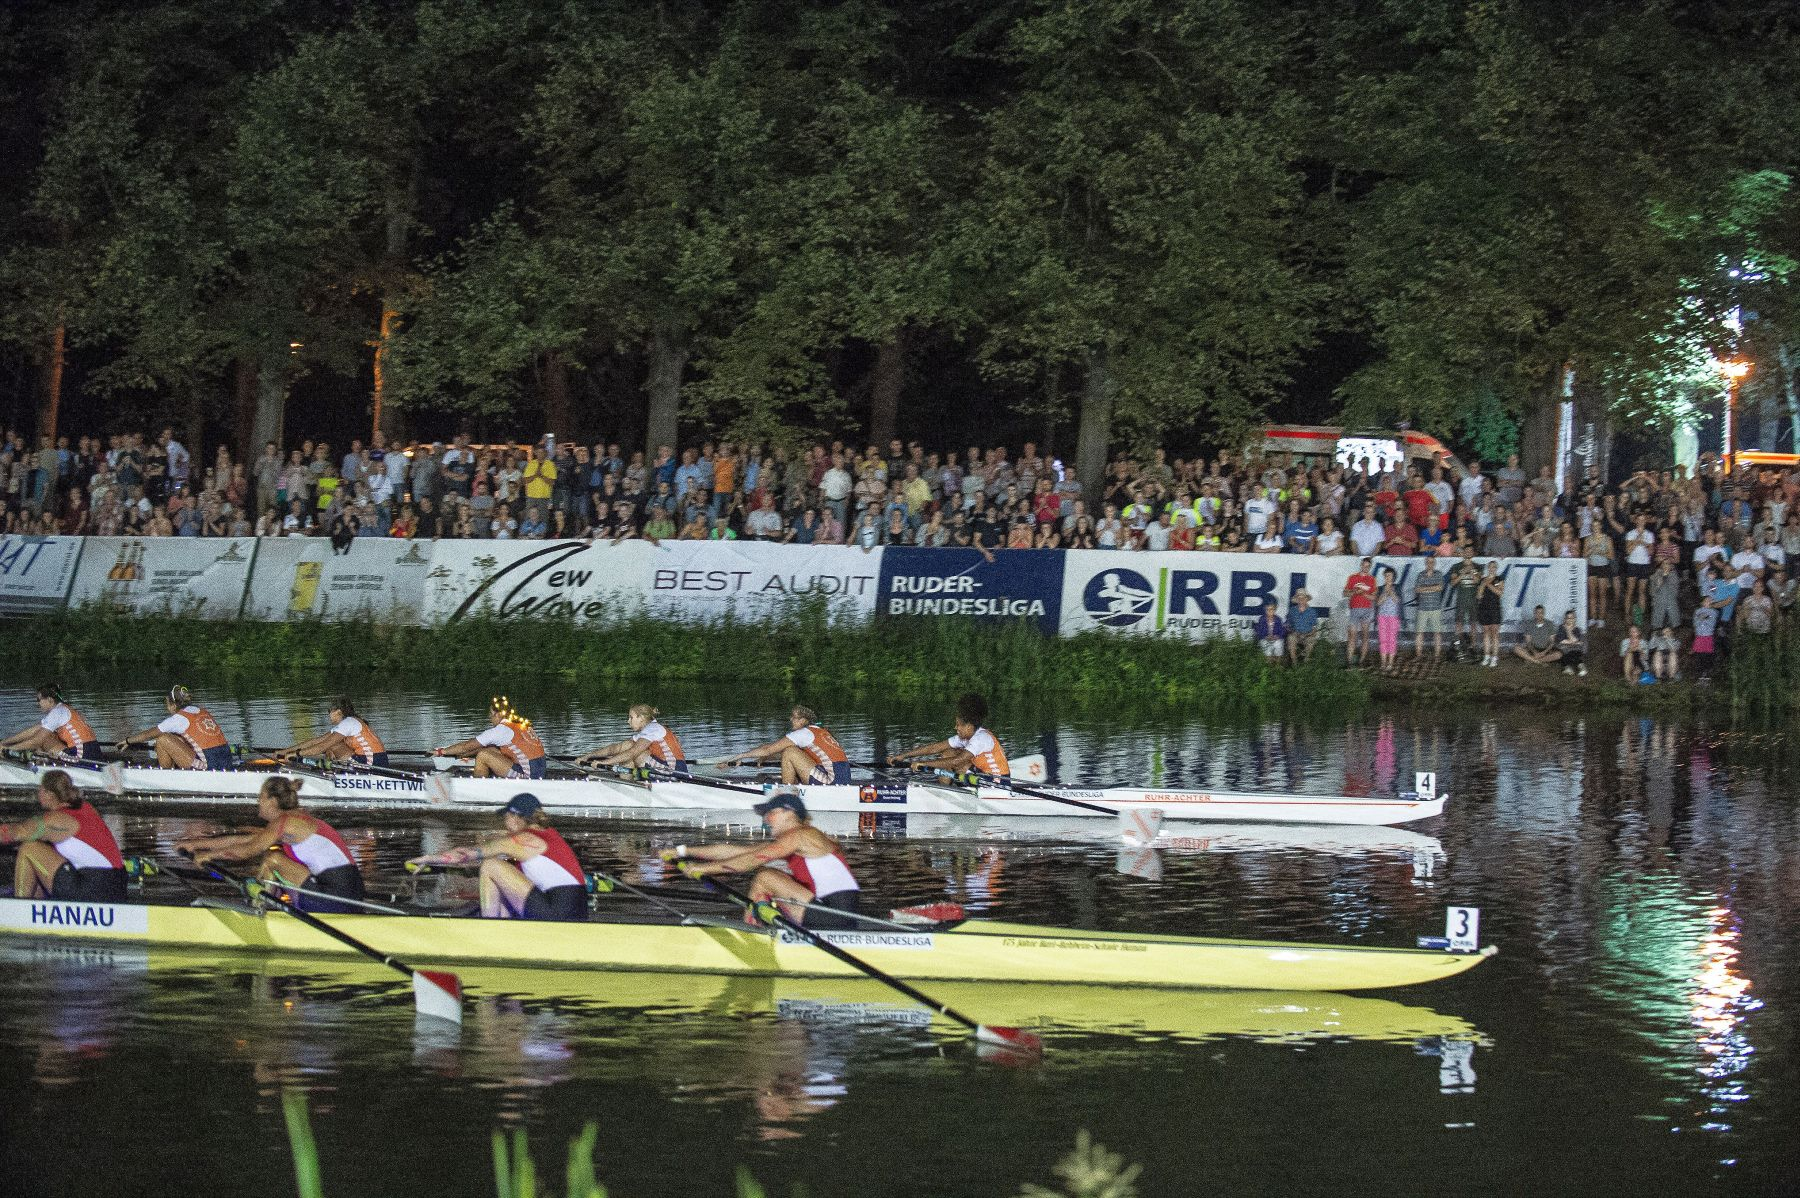 20180818_Frauen-Finale_Hanau-Kettwig_gross.jpg